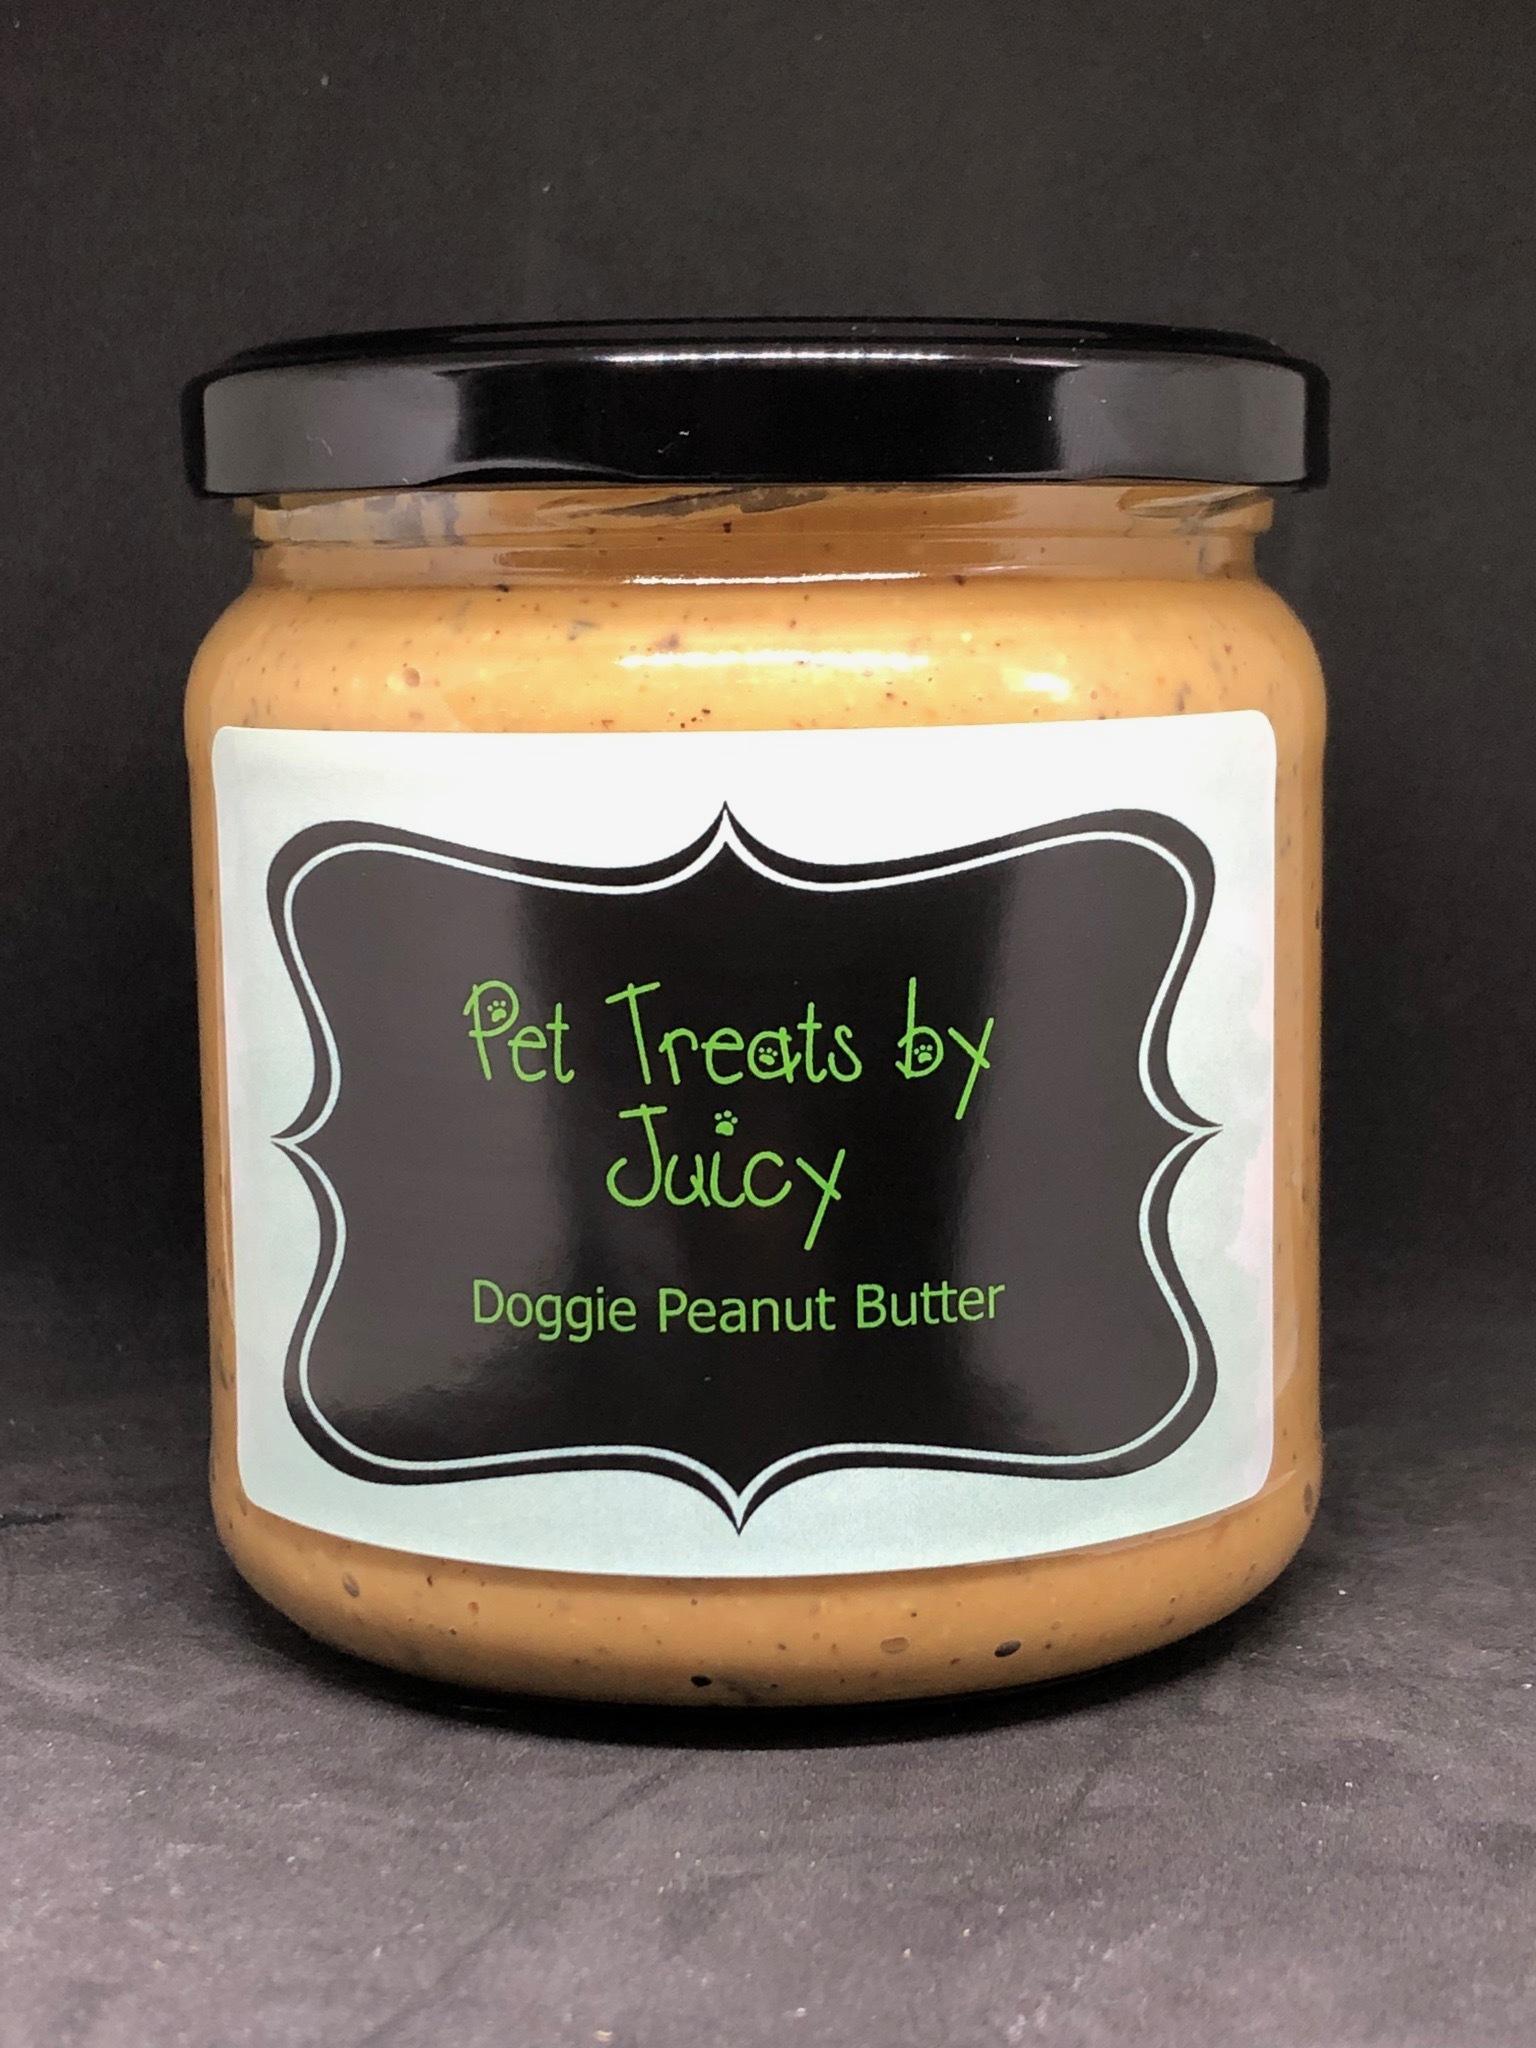 Doggie Peanut Butter 400g doggie-peanut-butter1